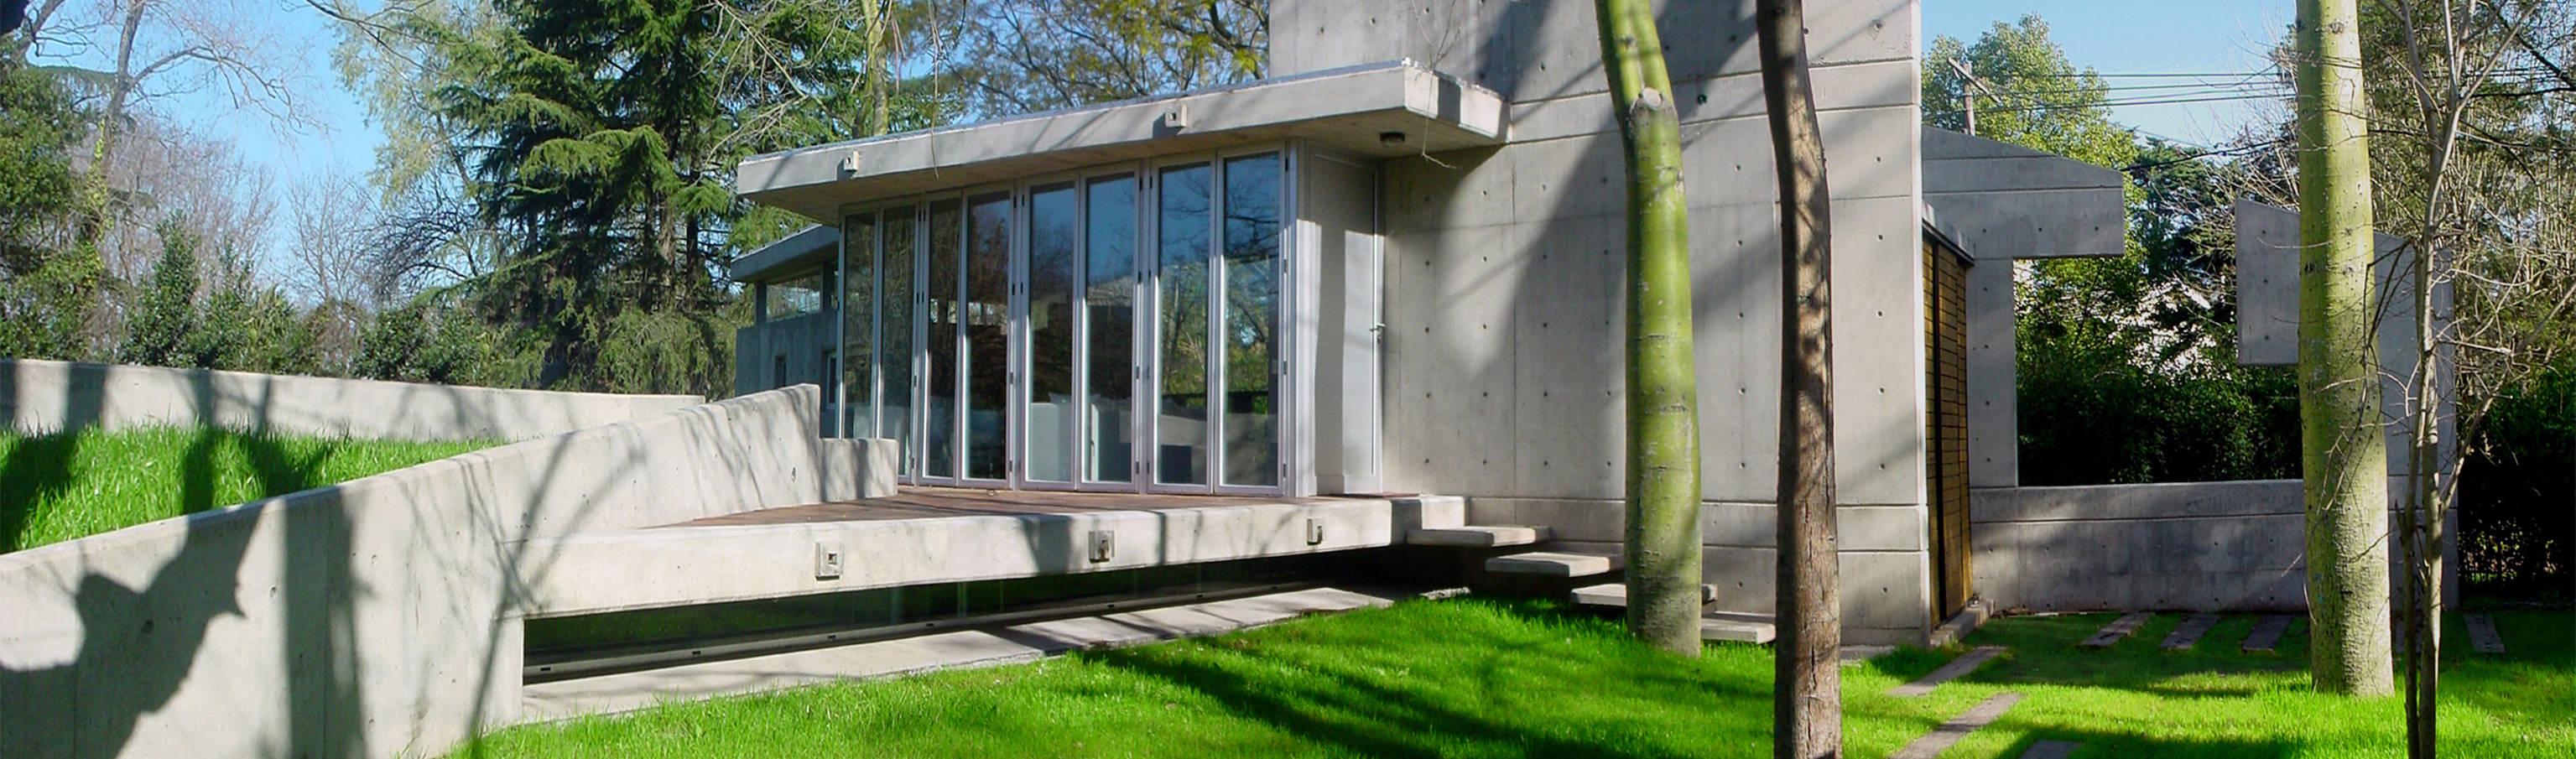 MZM | Maletti Zanel Maletti arquitectos